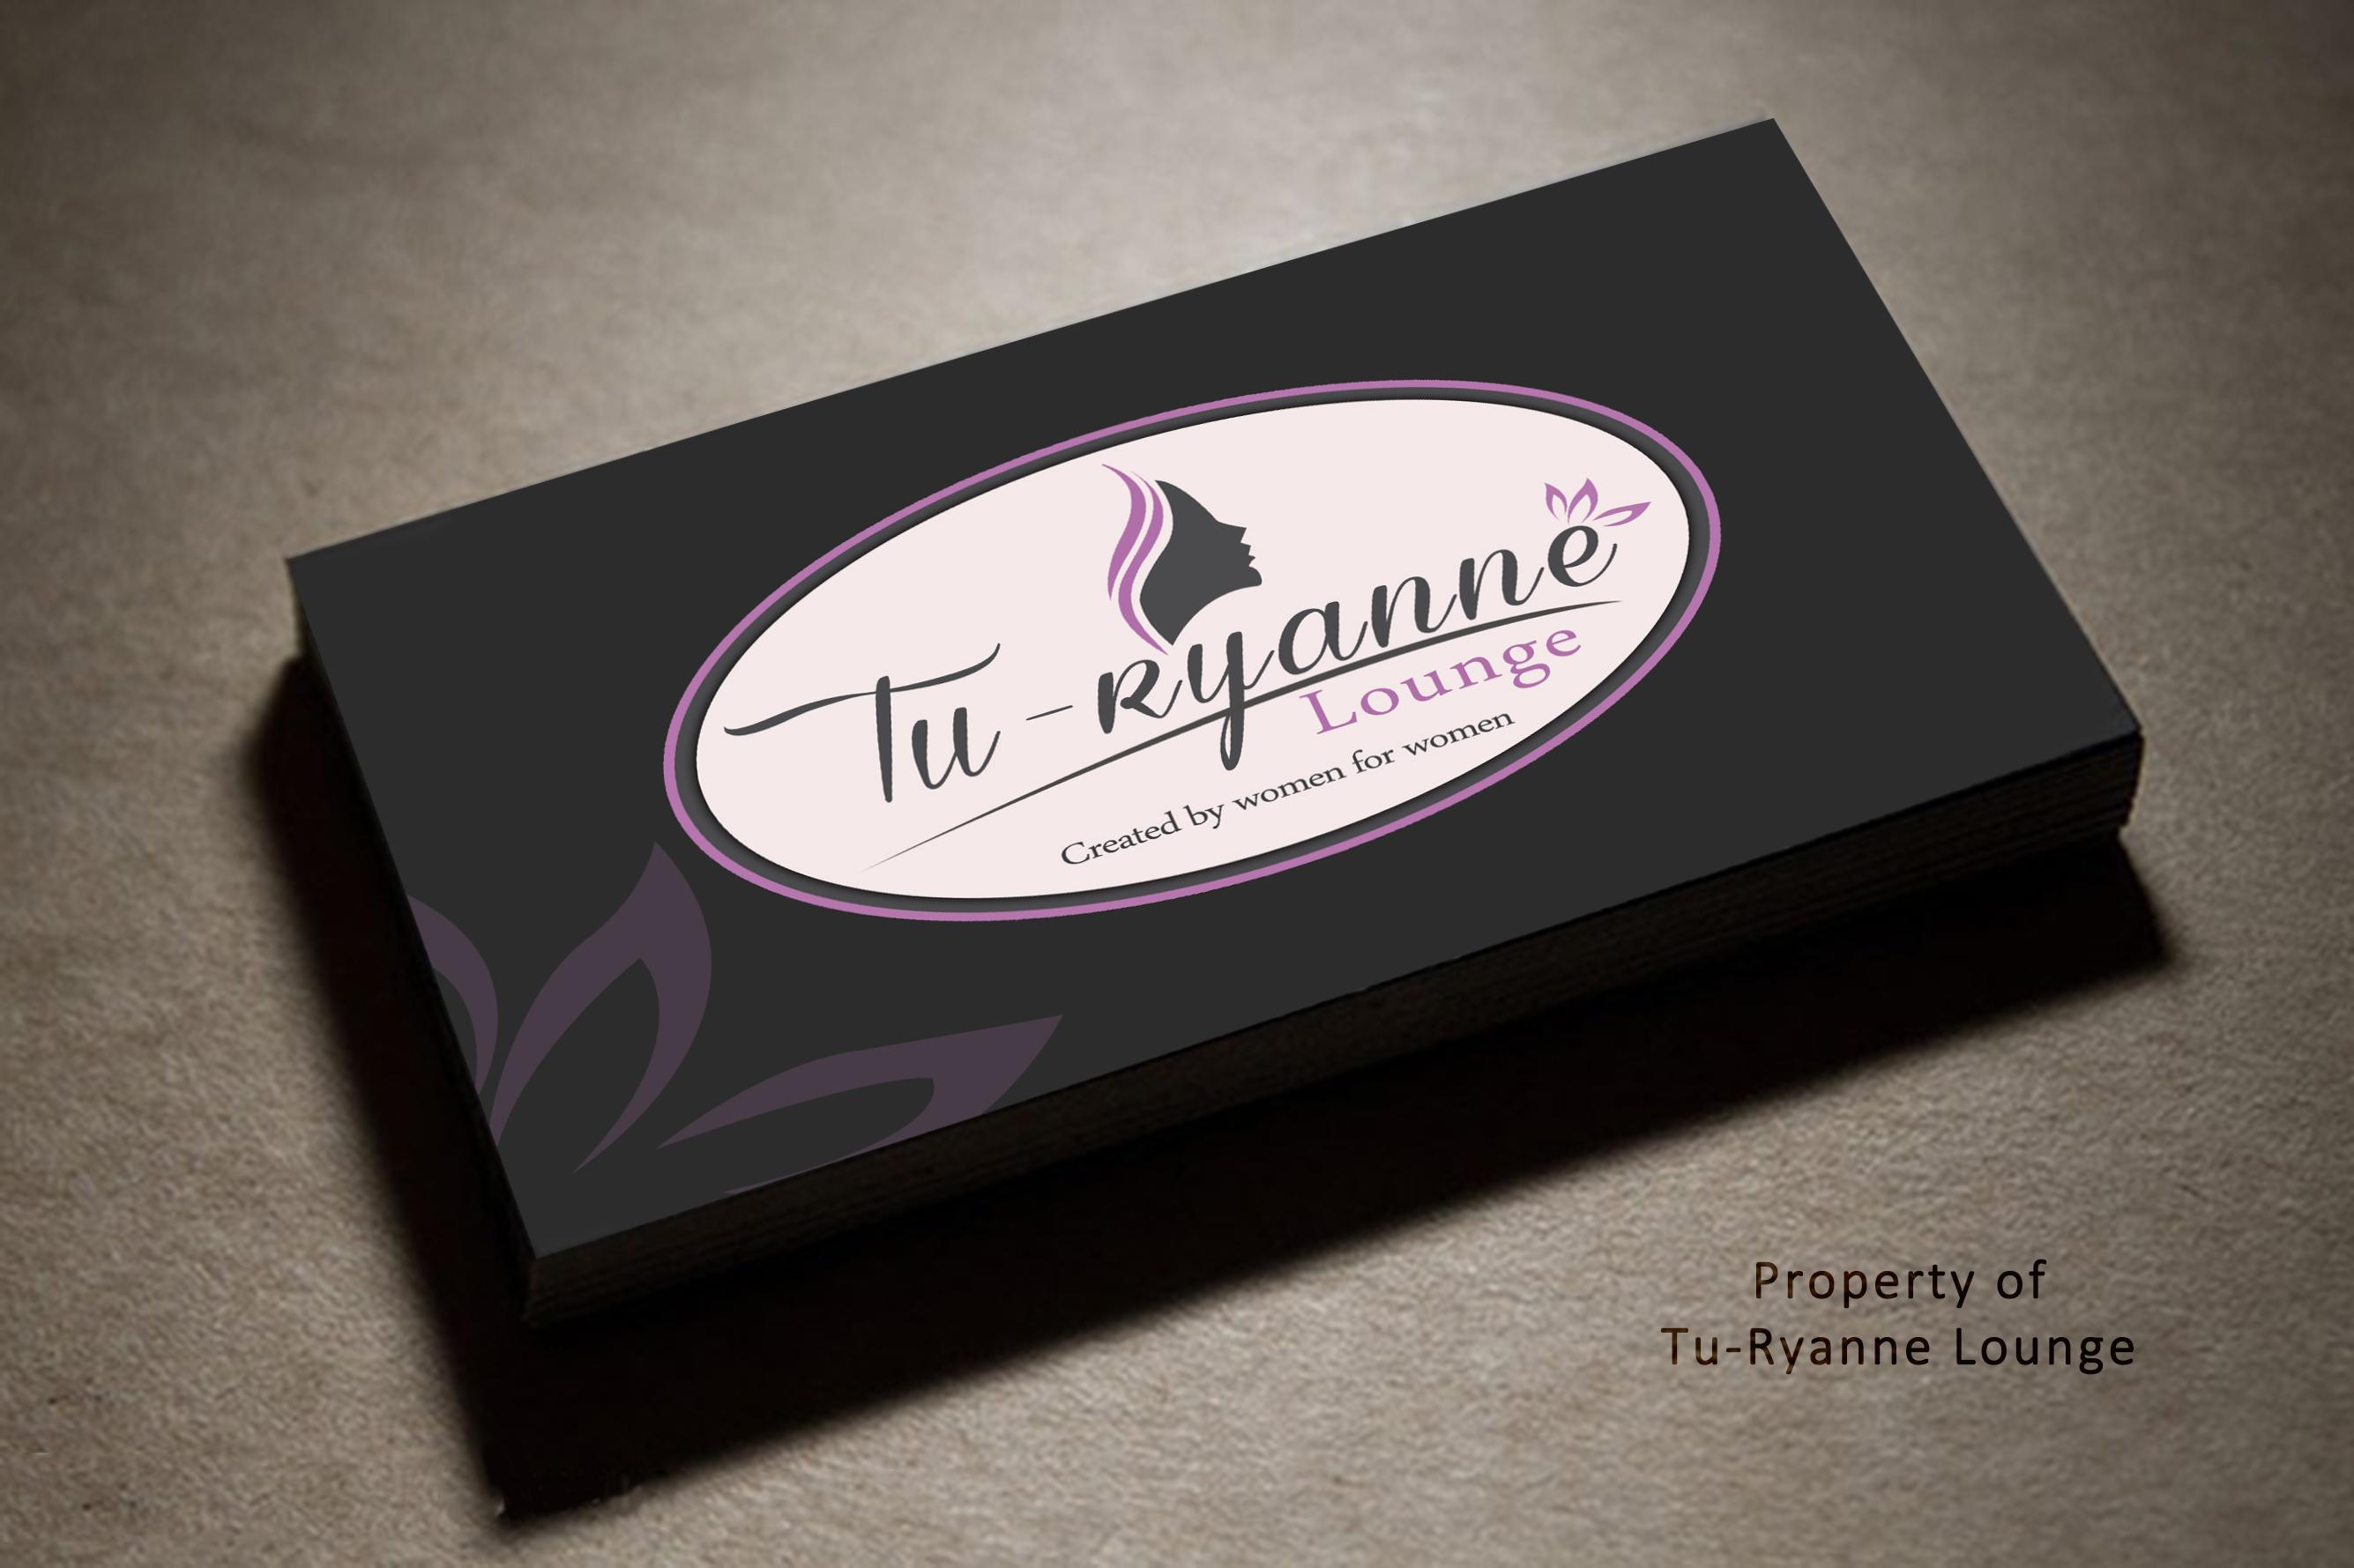 Tu-Ryanne